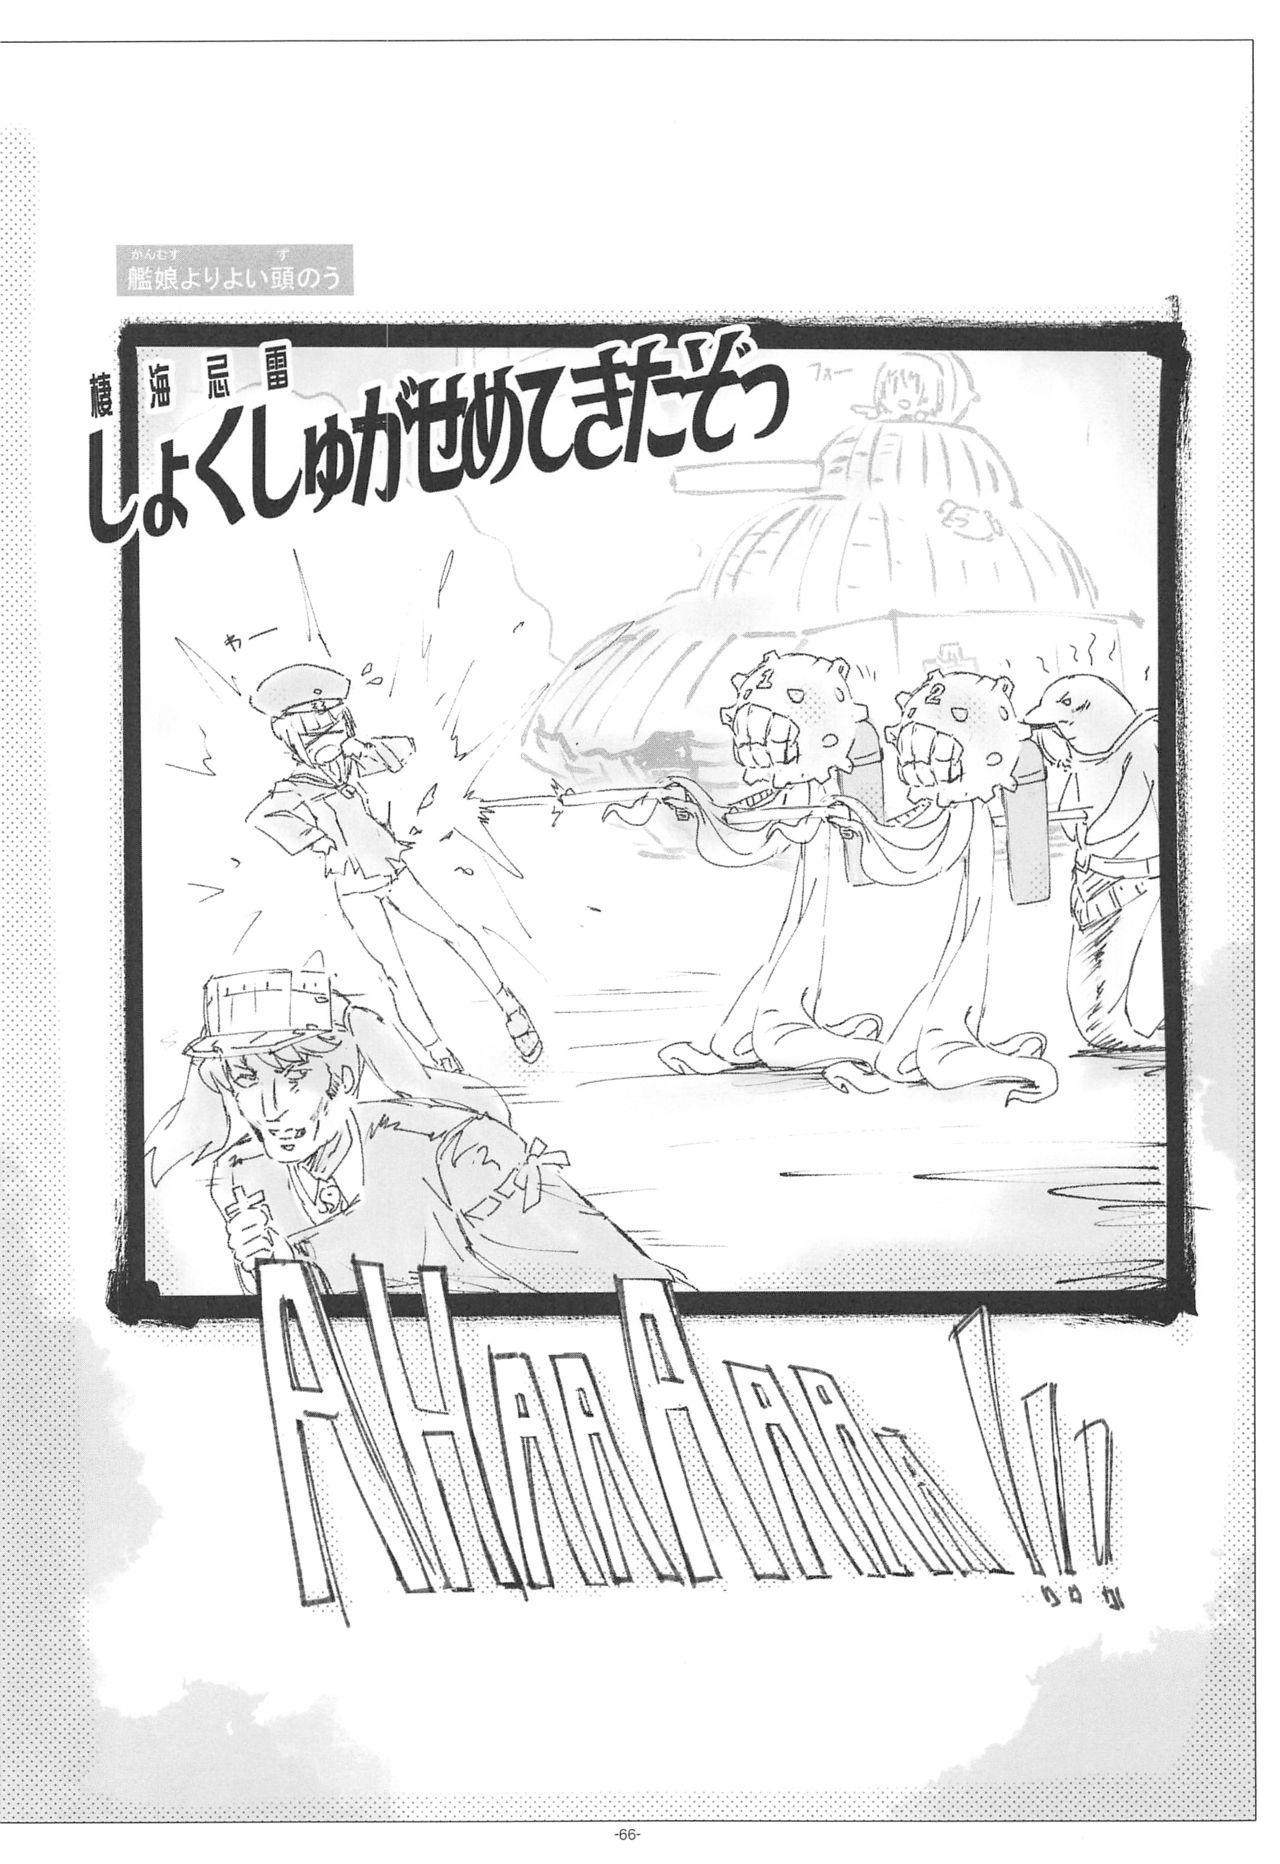 Korokoro-Manman II Korokoro:P Soushuuhen II 64